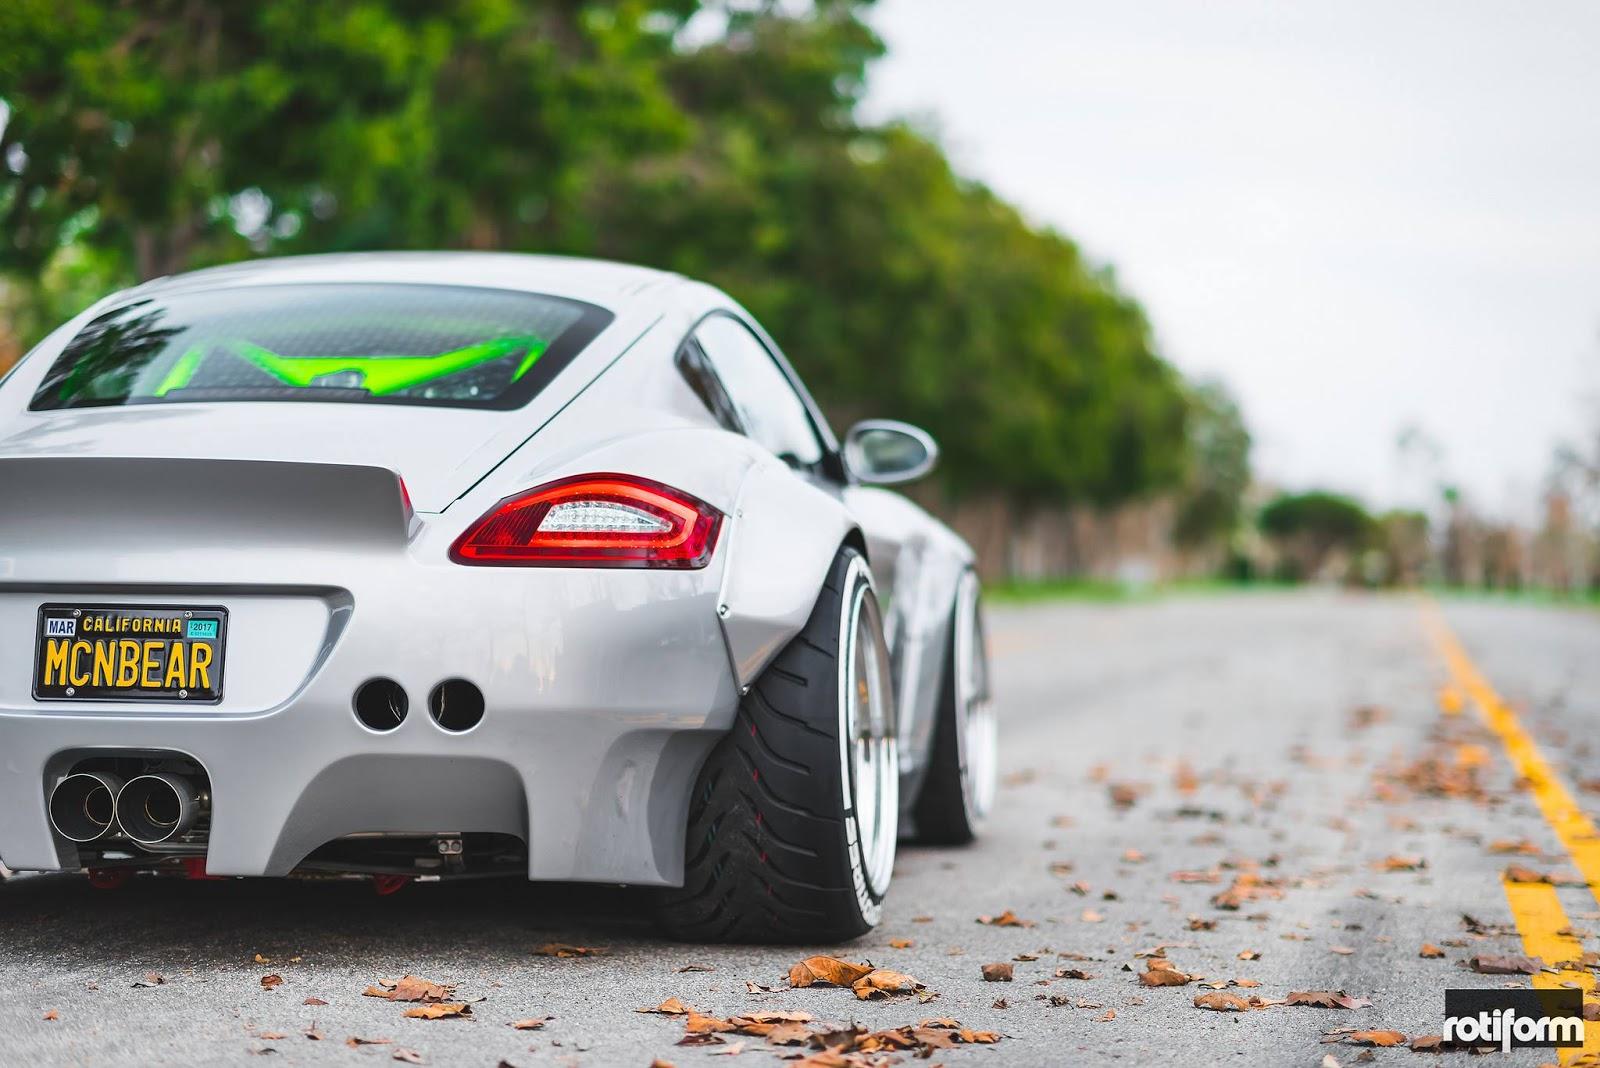 Custom Porsche Cayman Stuns With Its Ott Widebody Kit